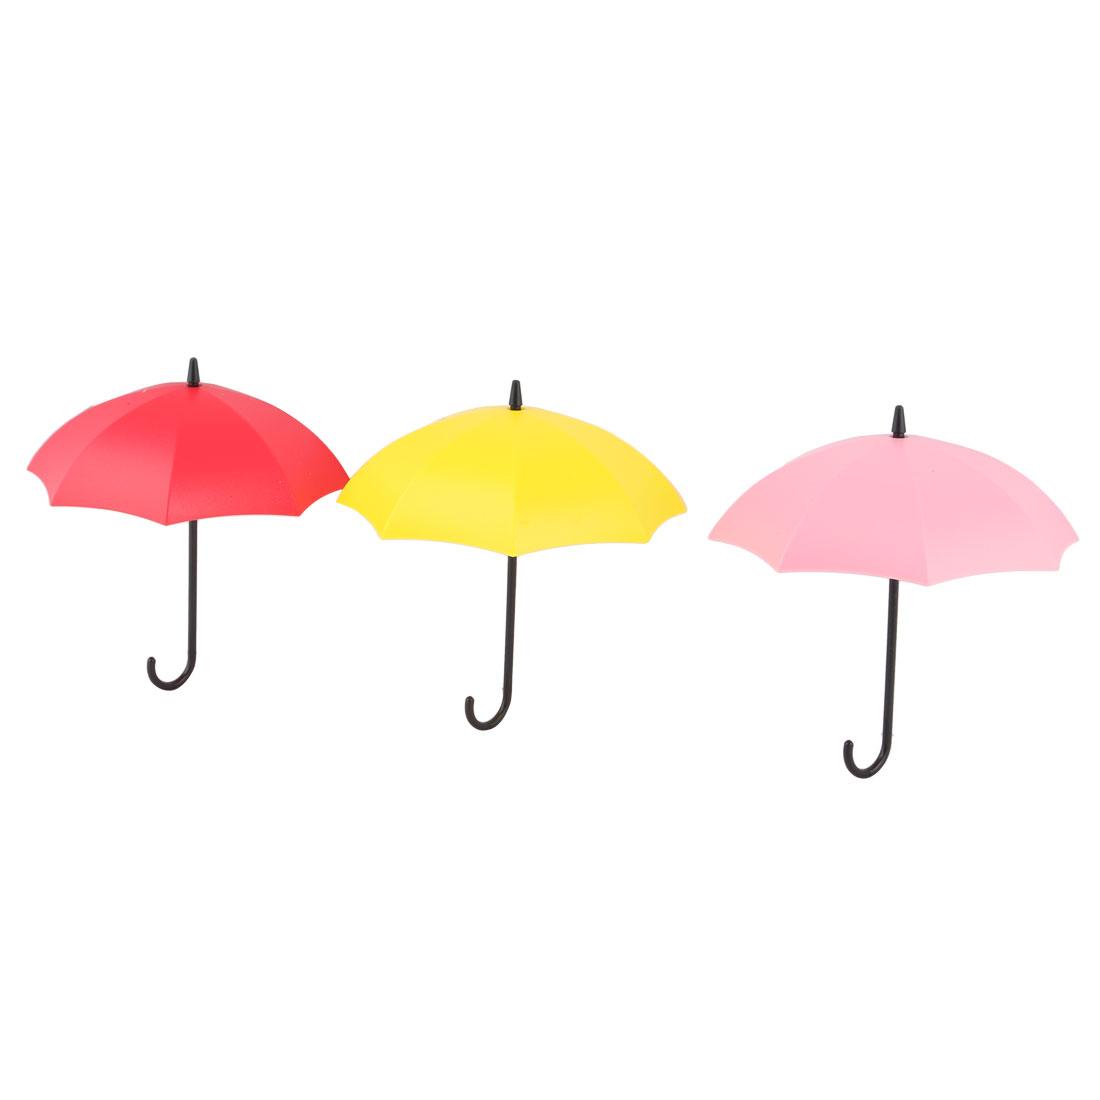 Plastic Umbrella Design Self-Adhesive Bathroom Kitchen Sticky Hooks Tri Color 3PCS